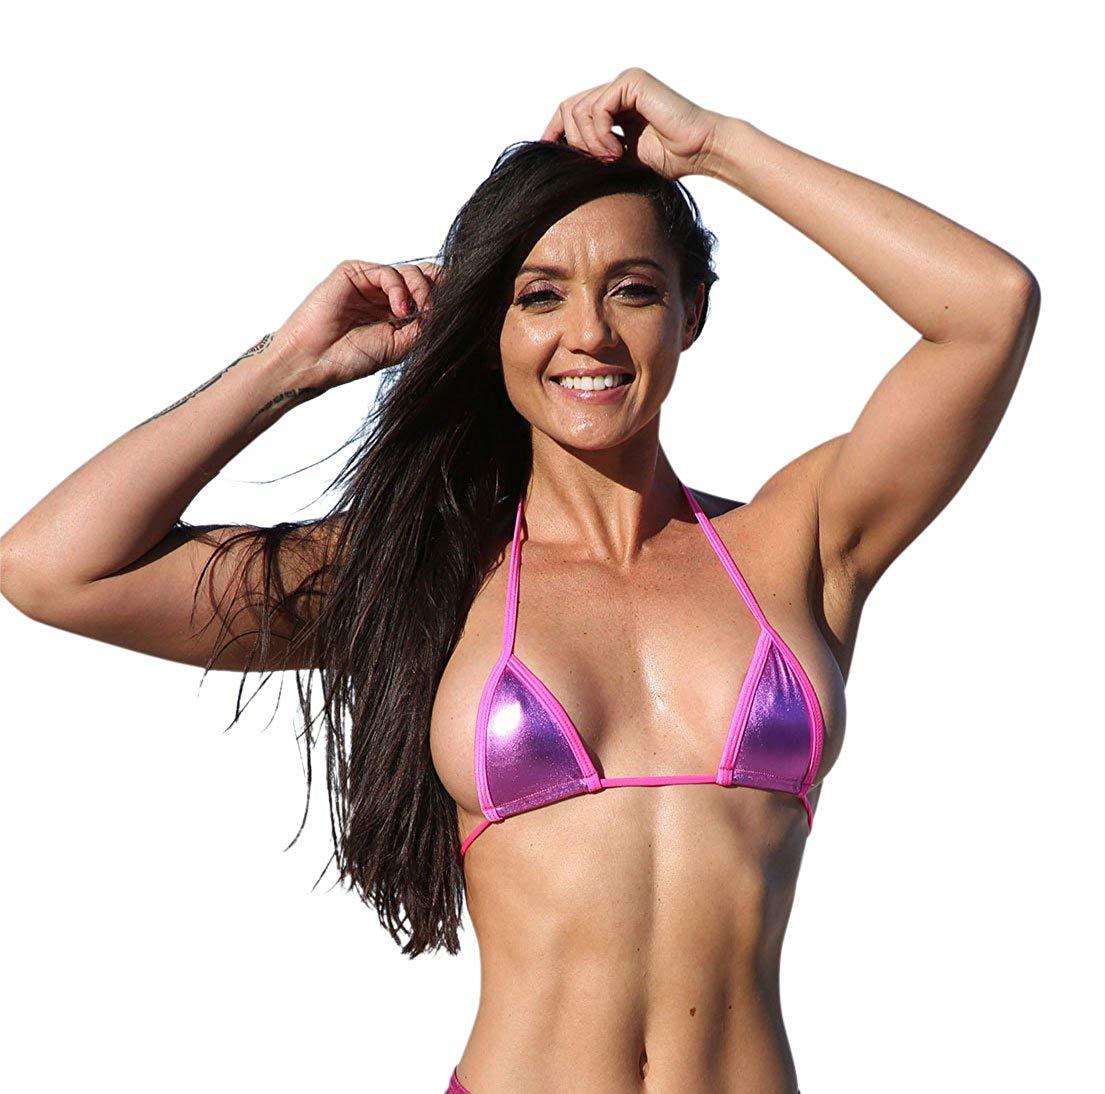 0e22a3a233e09 Get Quotations · Hot Pink Metallic Sassy Mini Triangle Top Bikini Tops